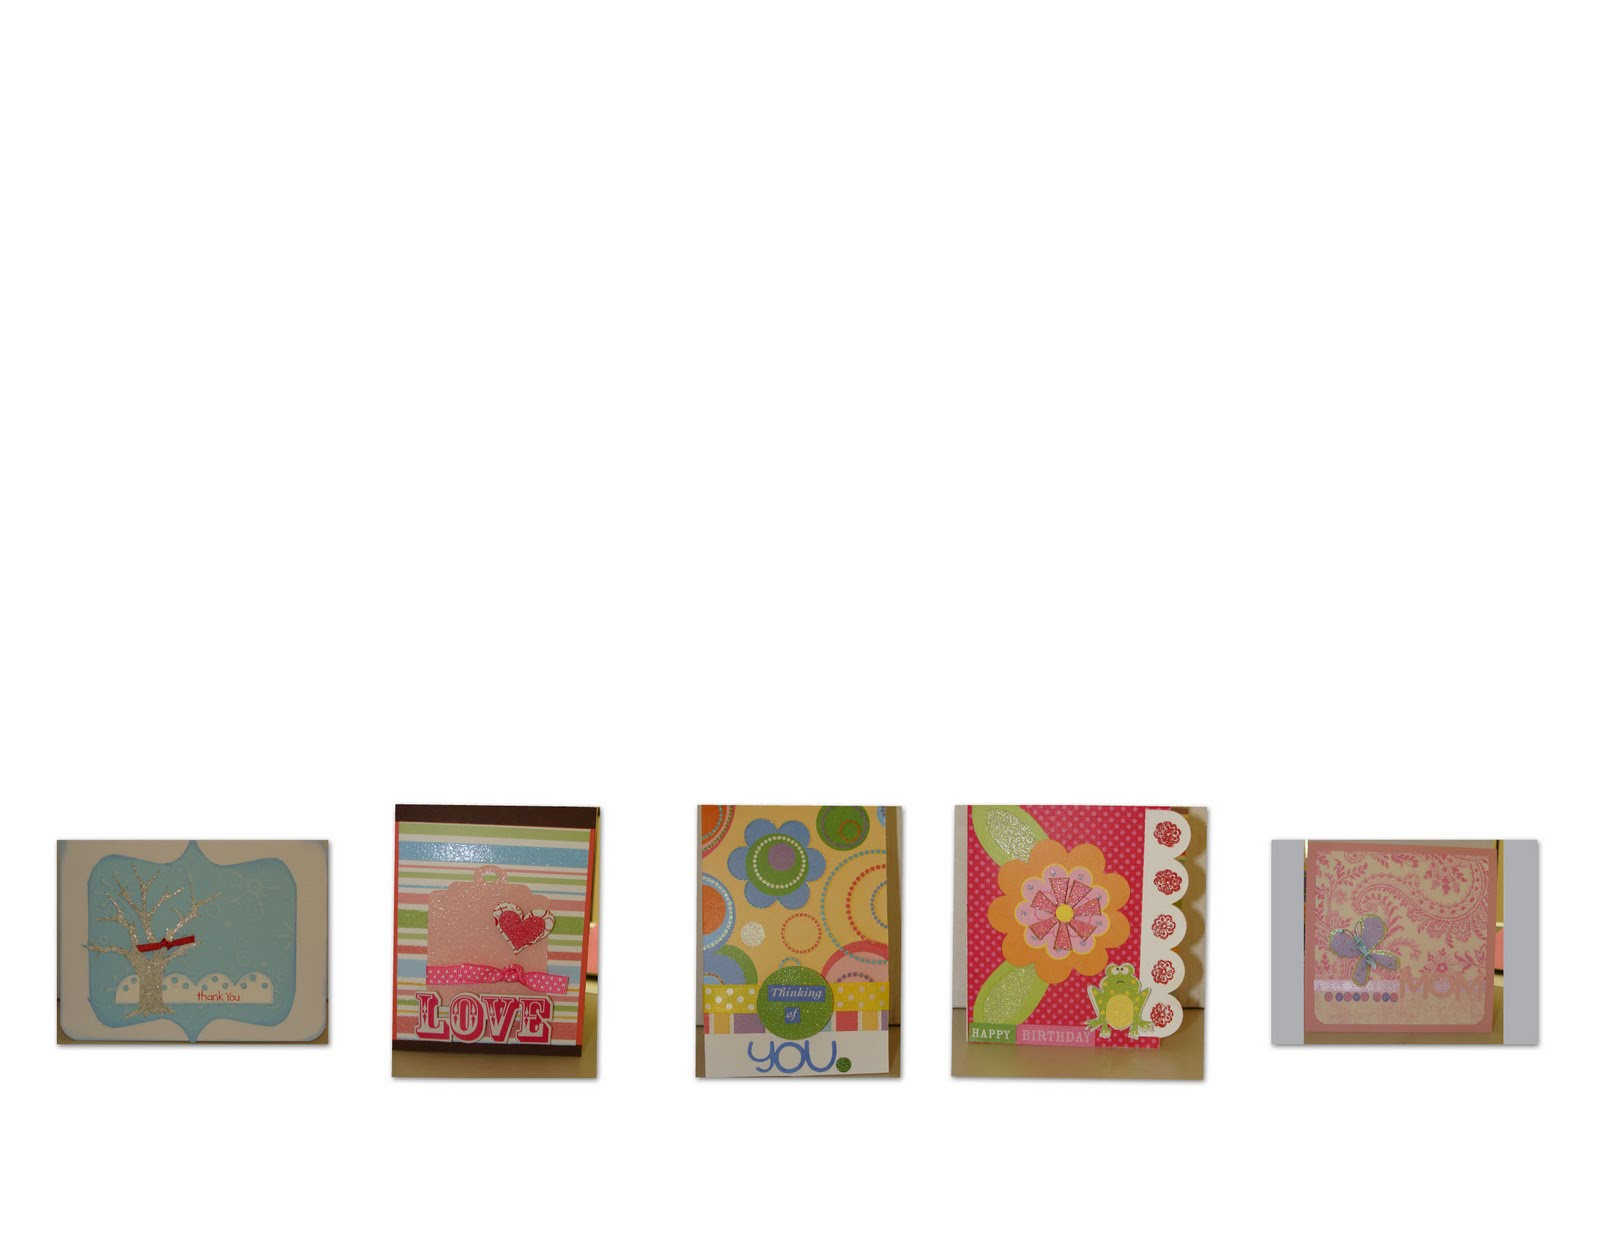 [World+Card+Making+09.jpg]